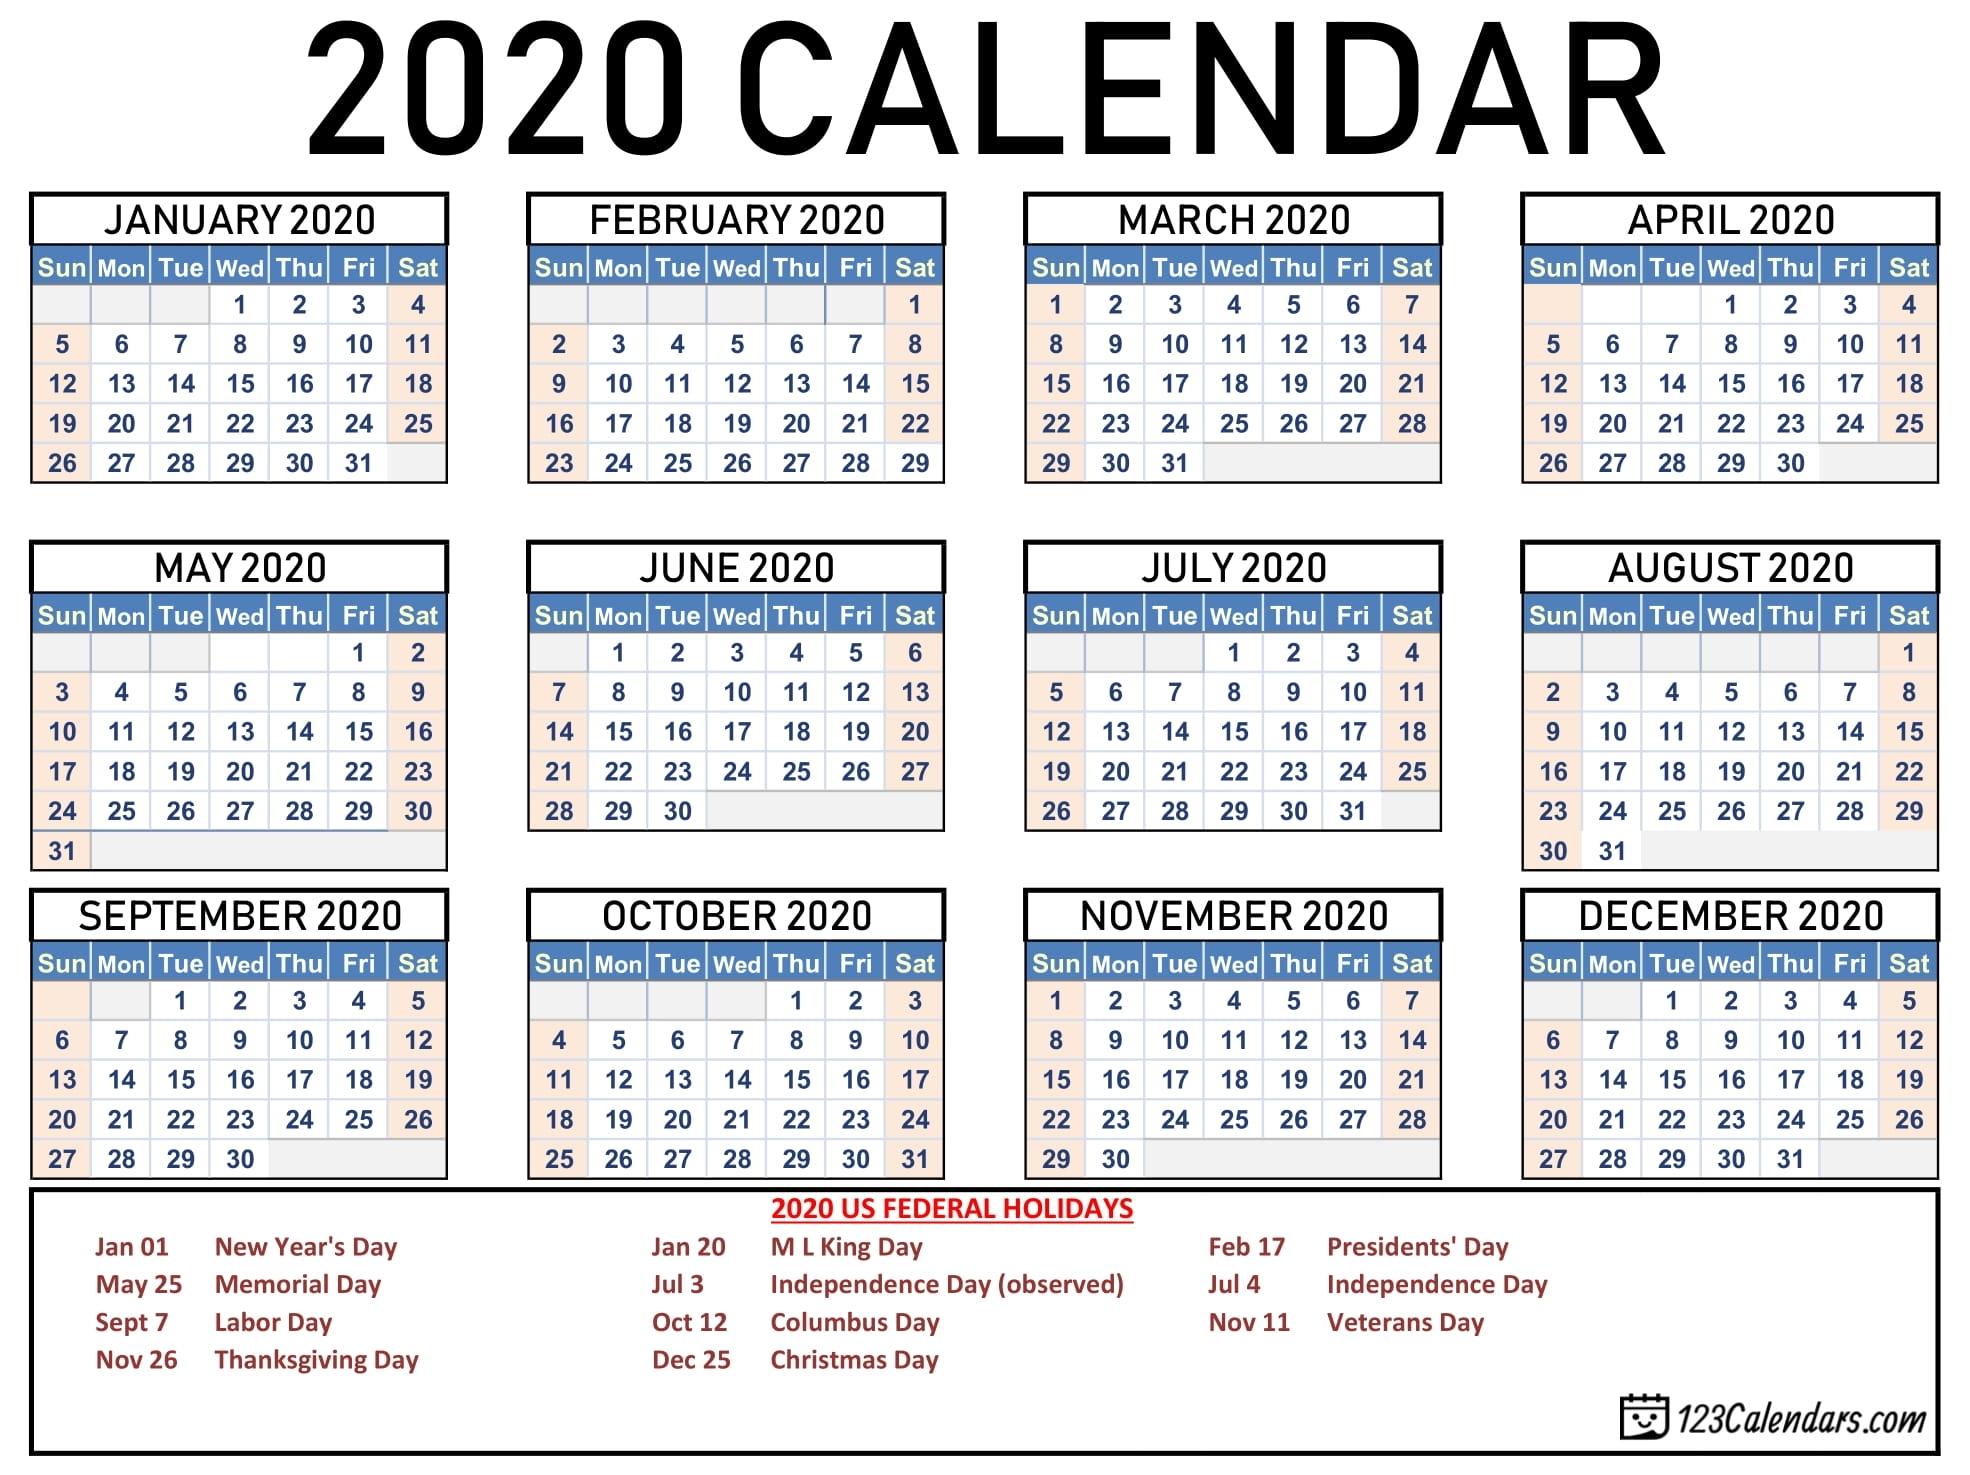 Free Printable 2020 Calendar | 123Calendars intended for Free Printable Pocket Size Calanders